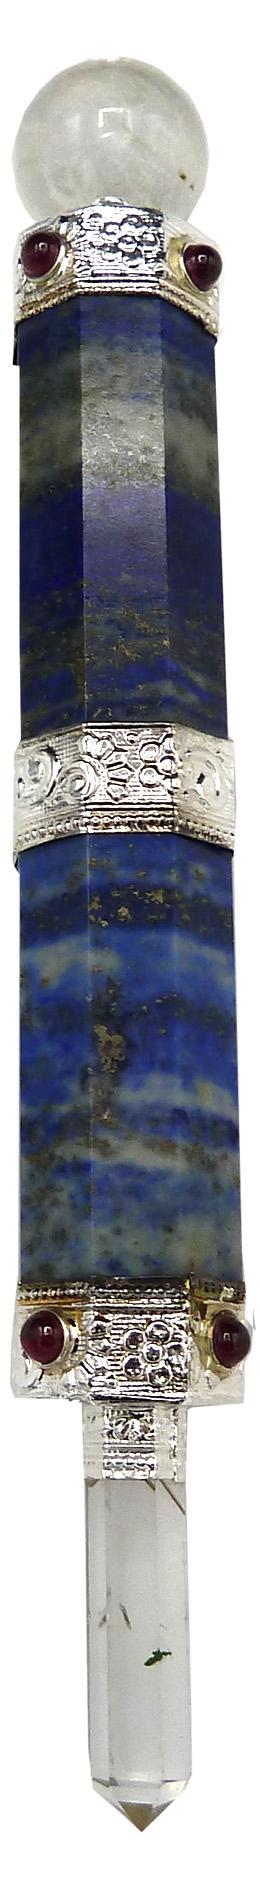 Bâton de soin Lapis Lazuli 15cm